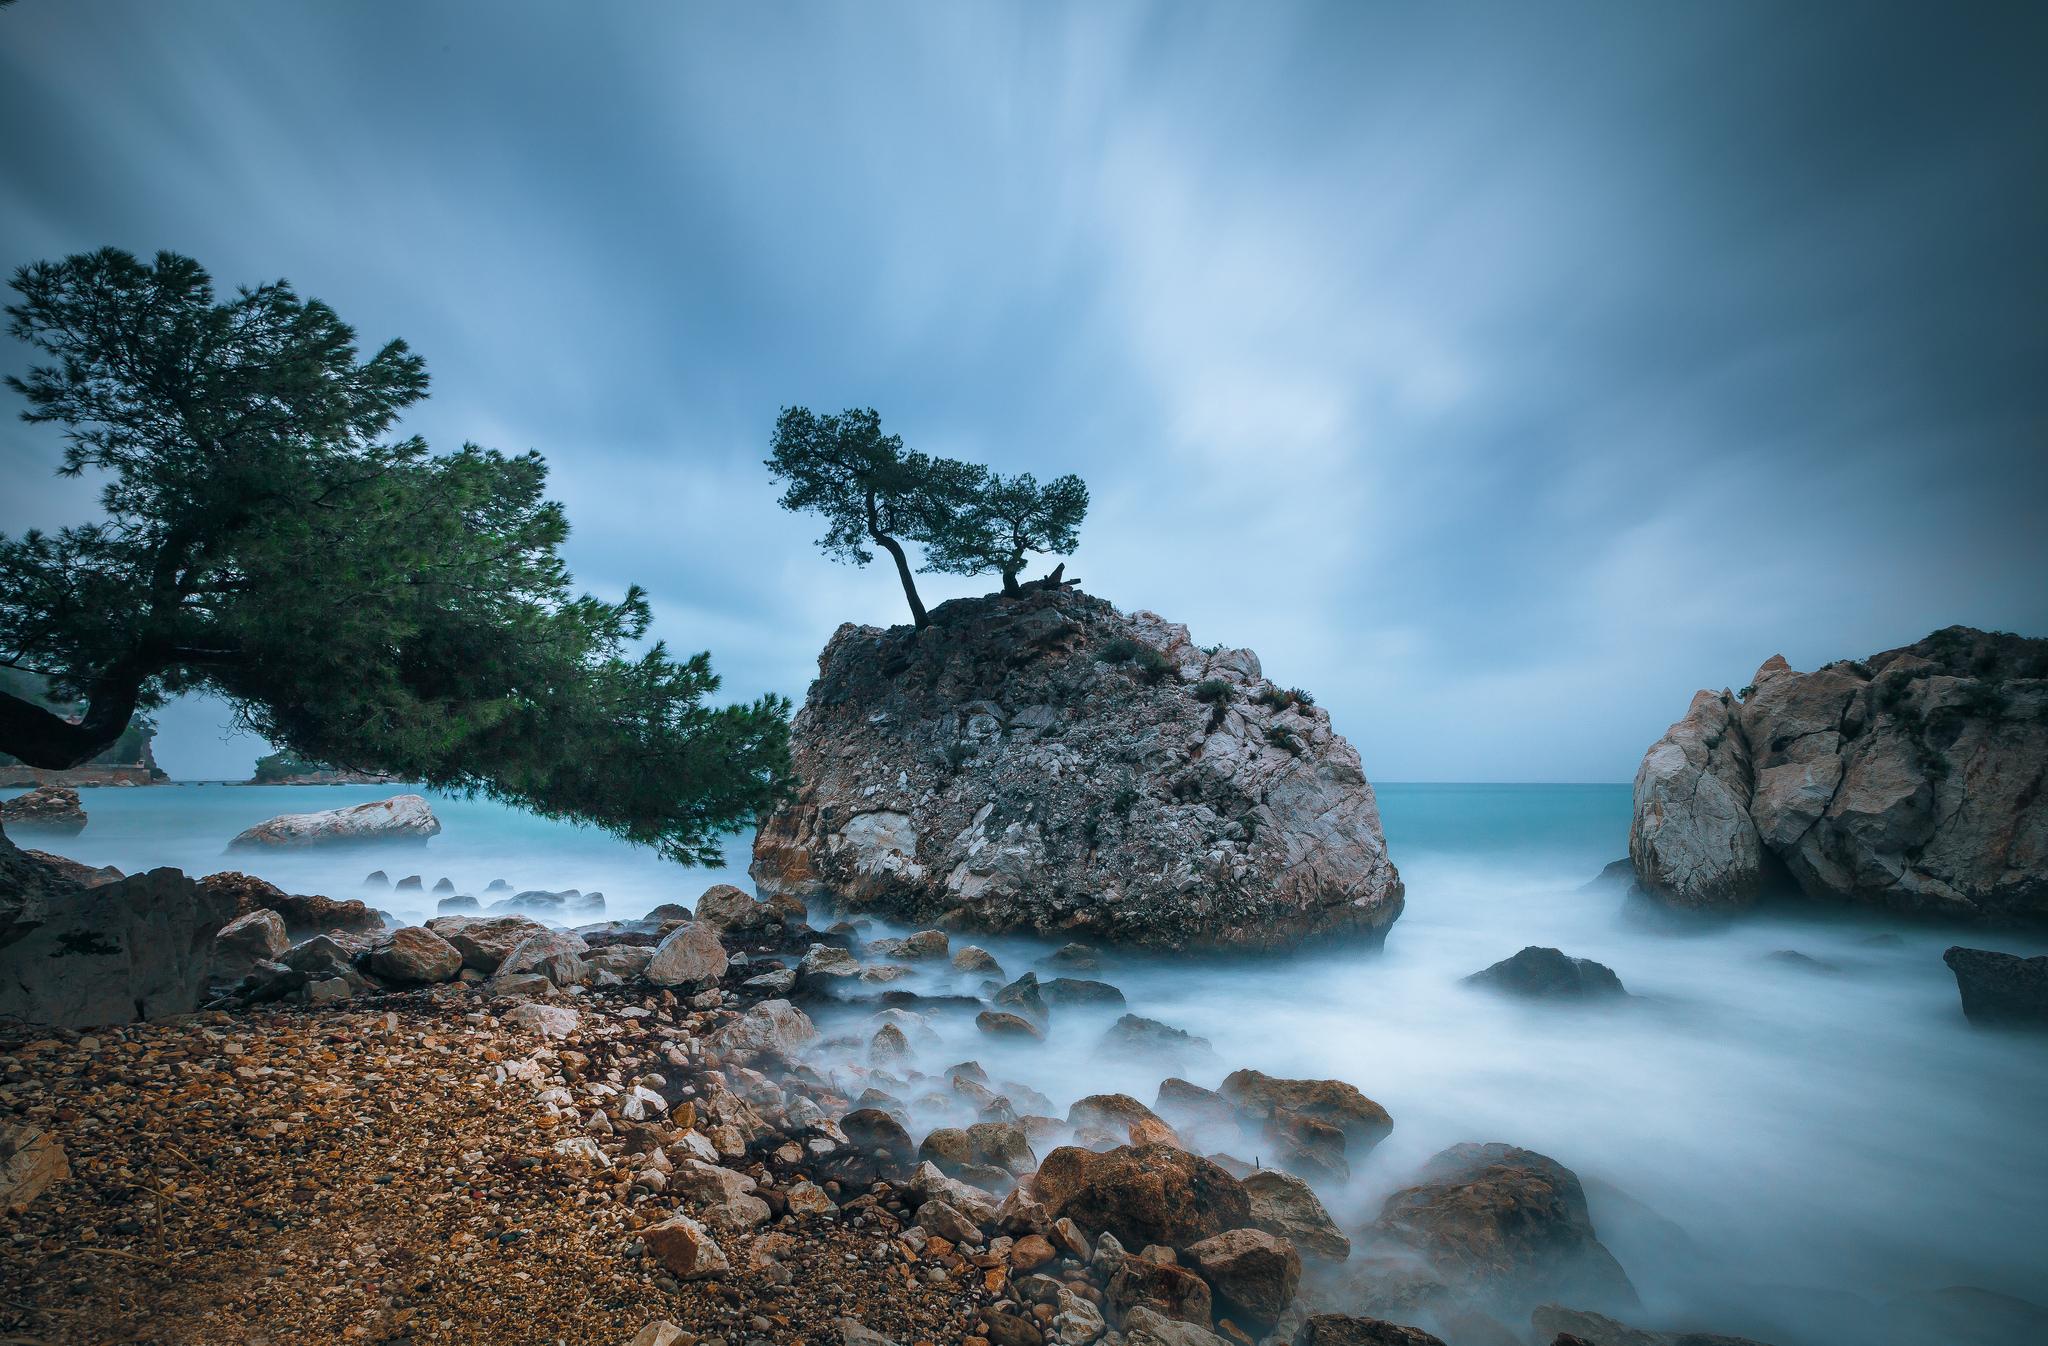 скала море камни rock sea stones  № 45290 загрузить